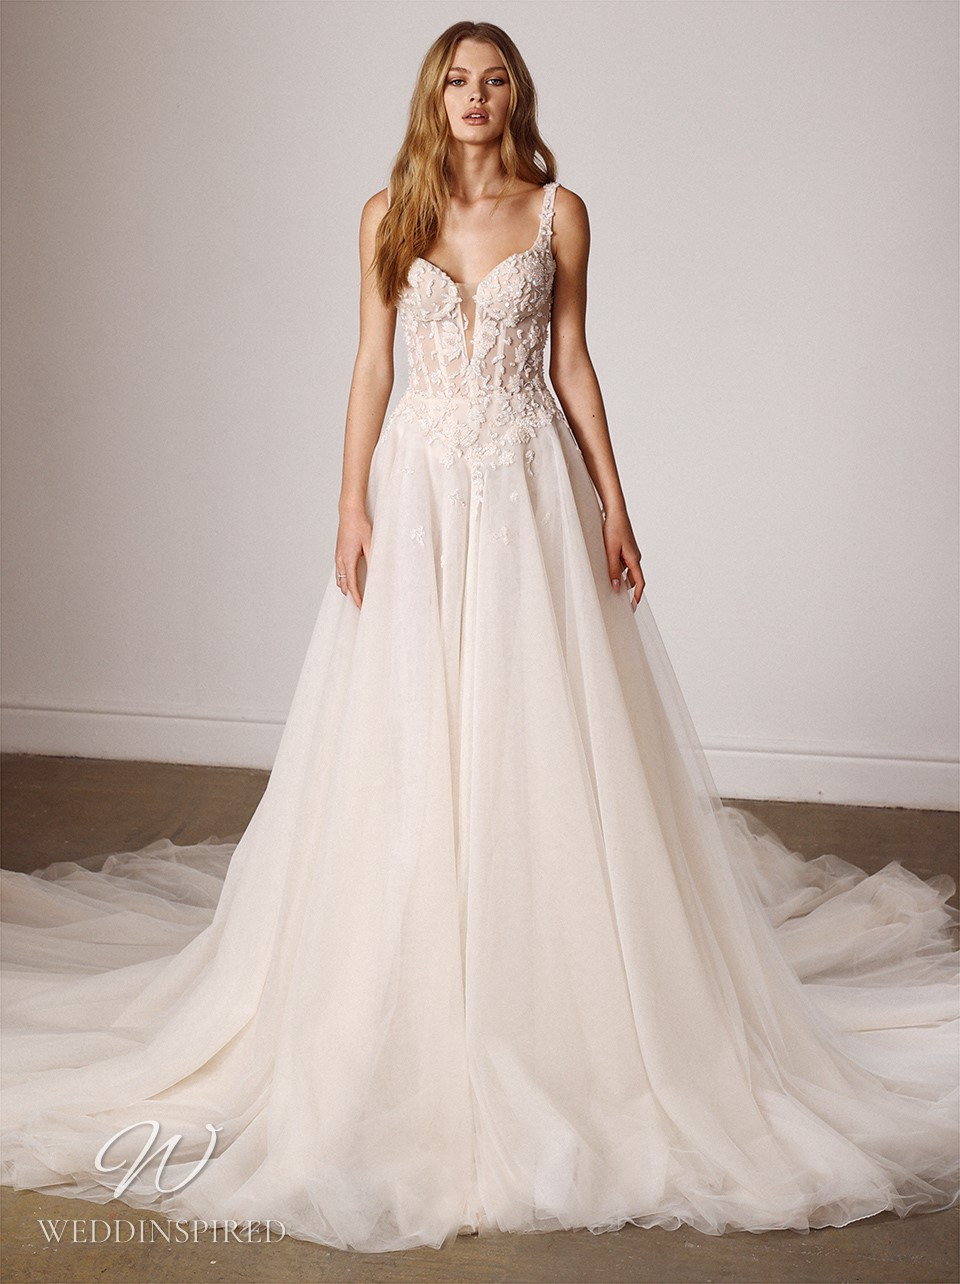 A Galia Lahav 2022 blush tulle A-line wedding dress